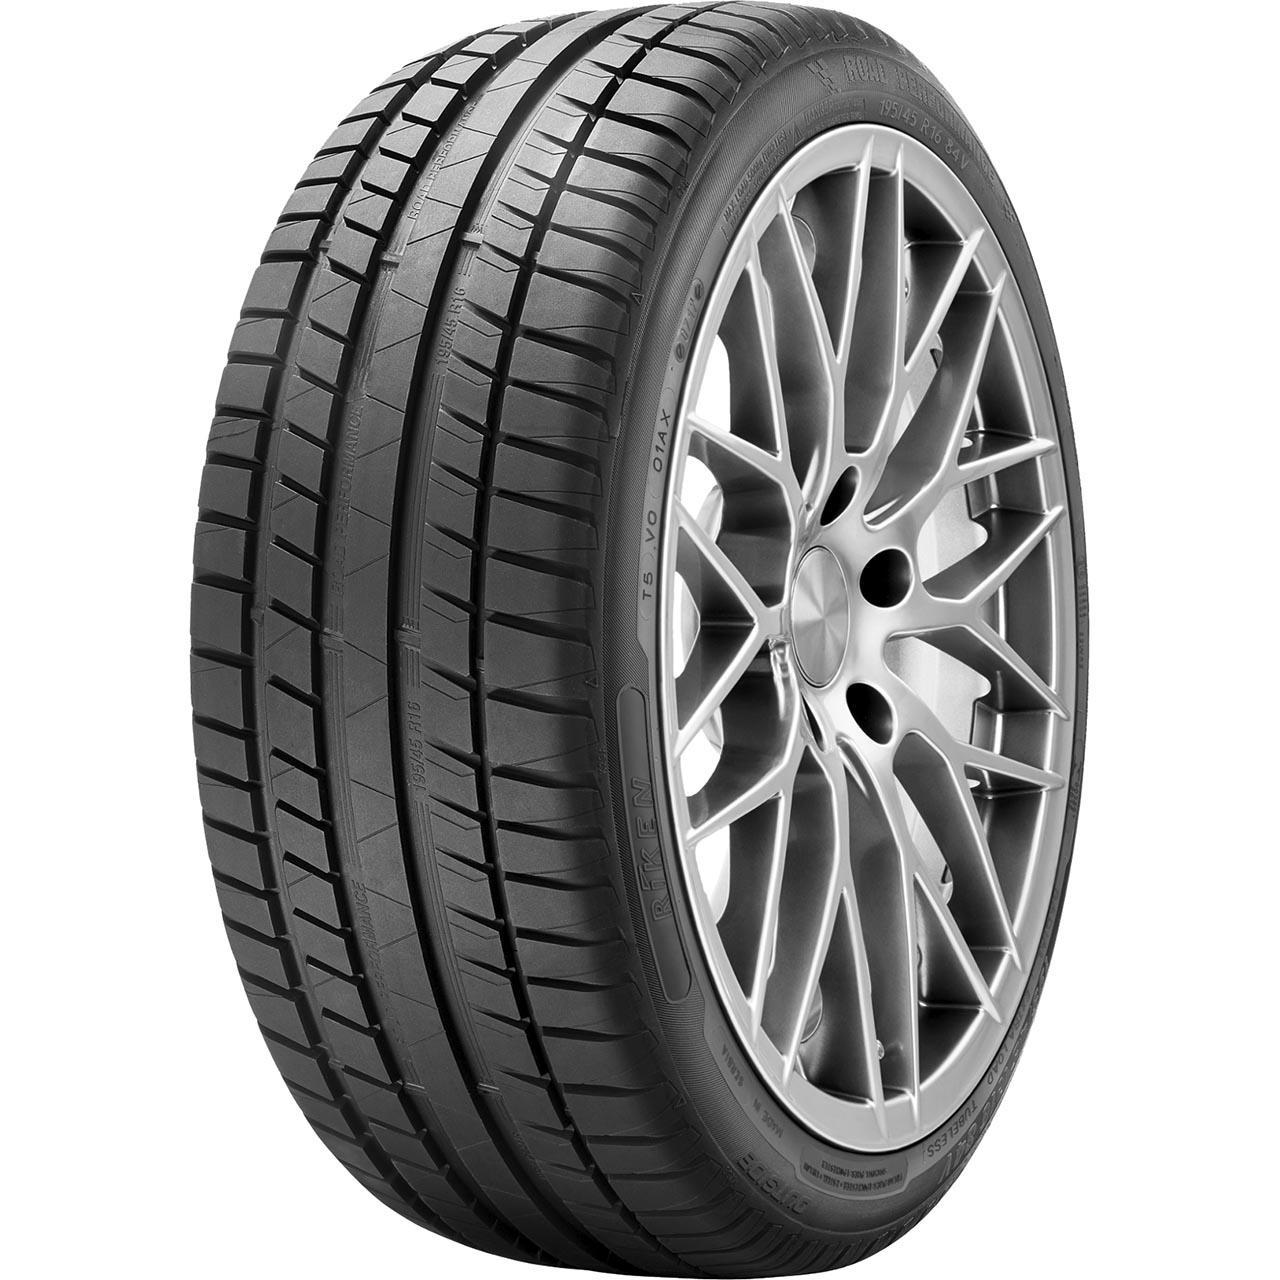 Riken Road Performance 205/55R16 91H